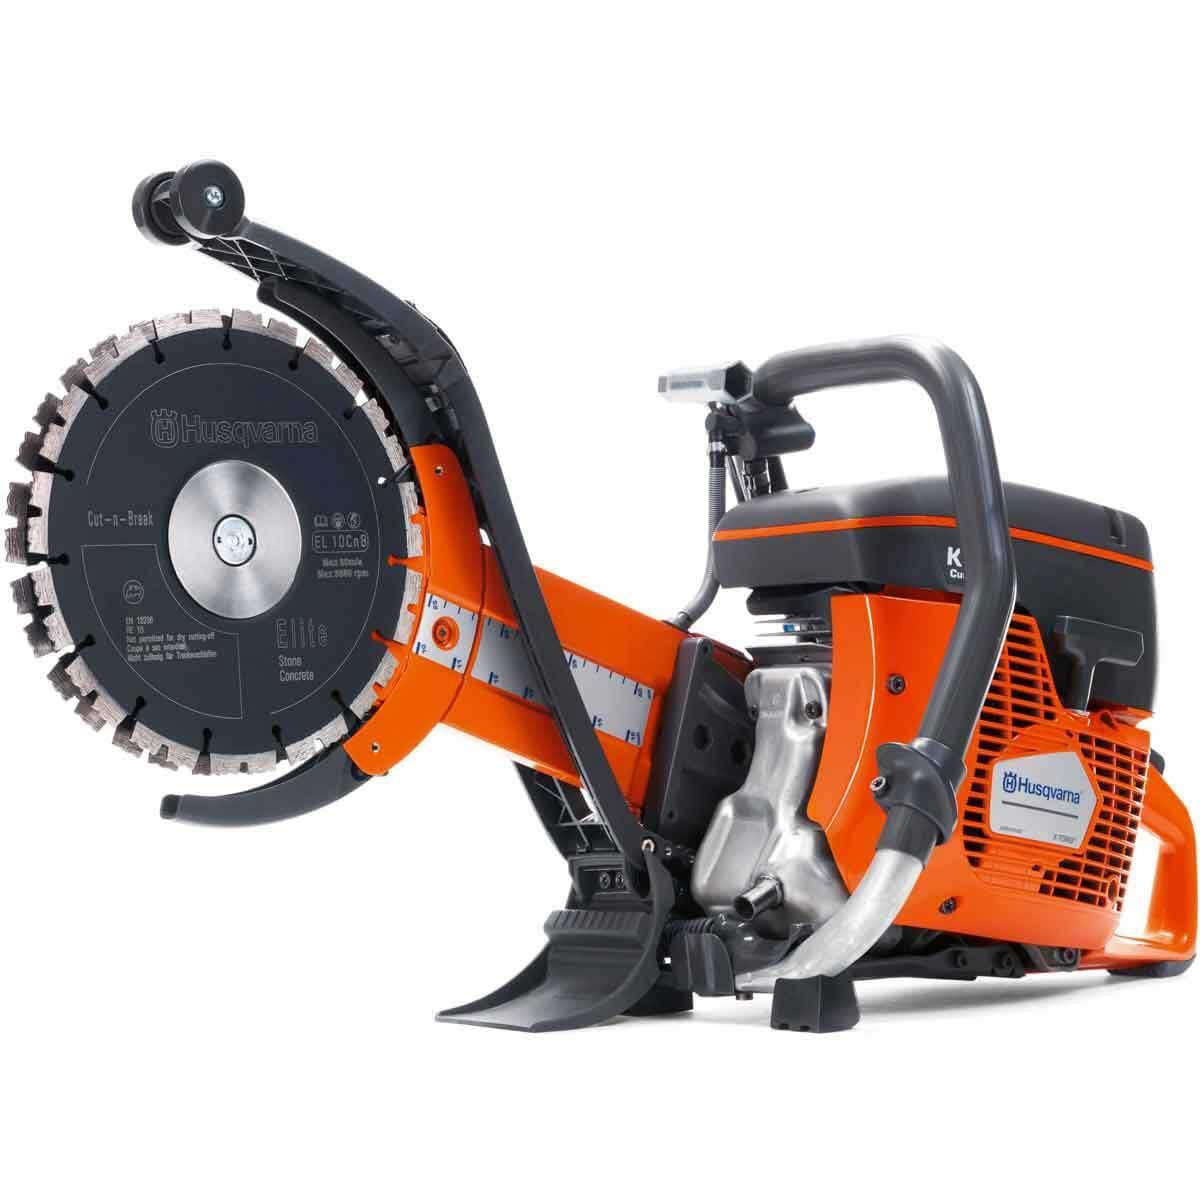 Concrete Cutting Saws : Husqvarna k cut n break saw contractors direct